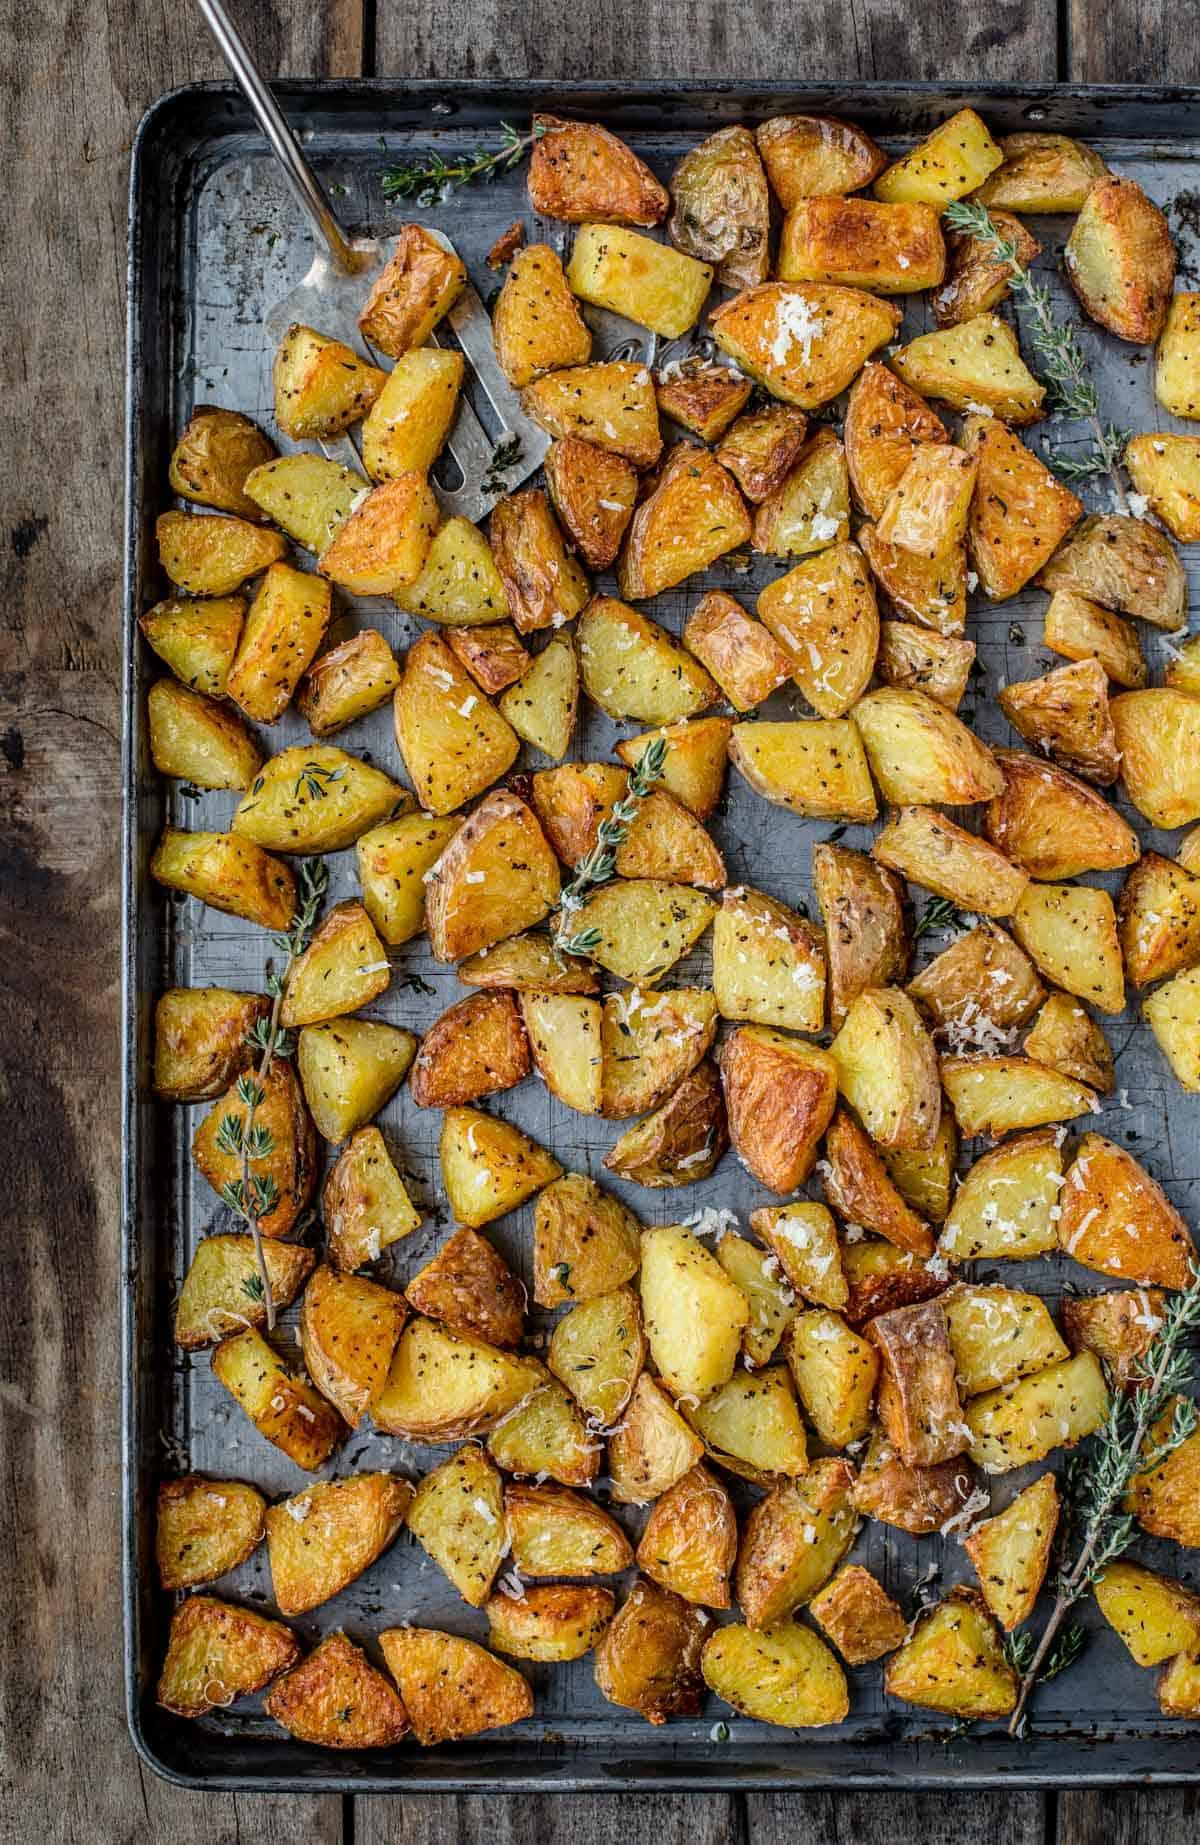 Roasted Duck Fat Potatoes on a sheet pan